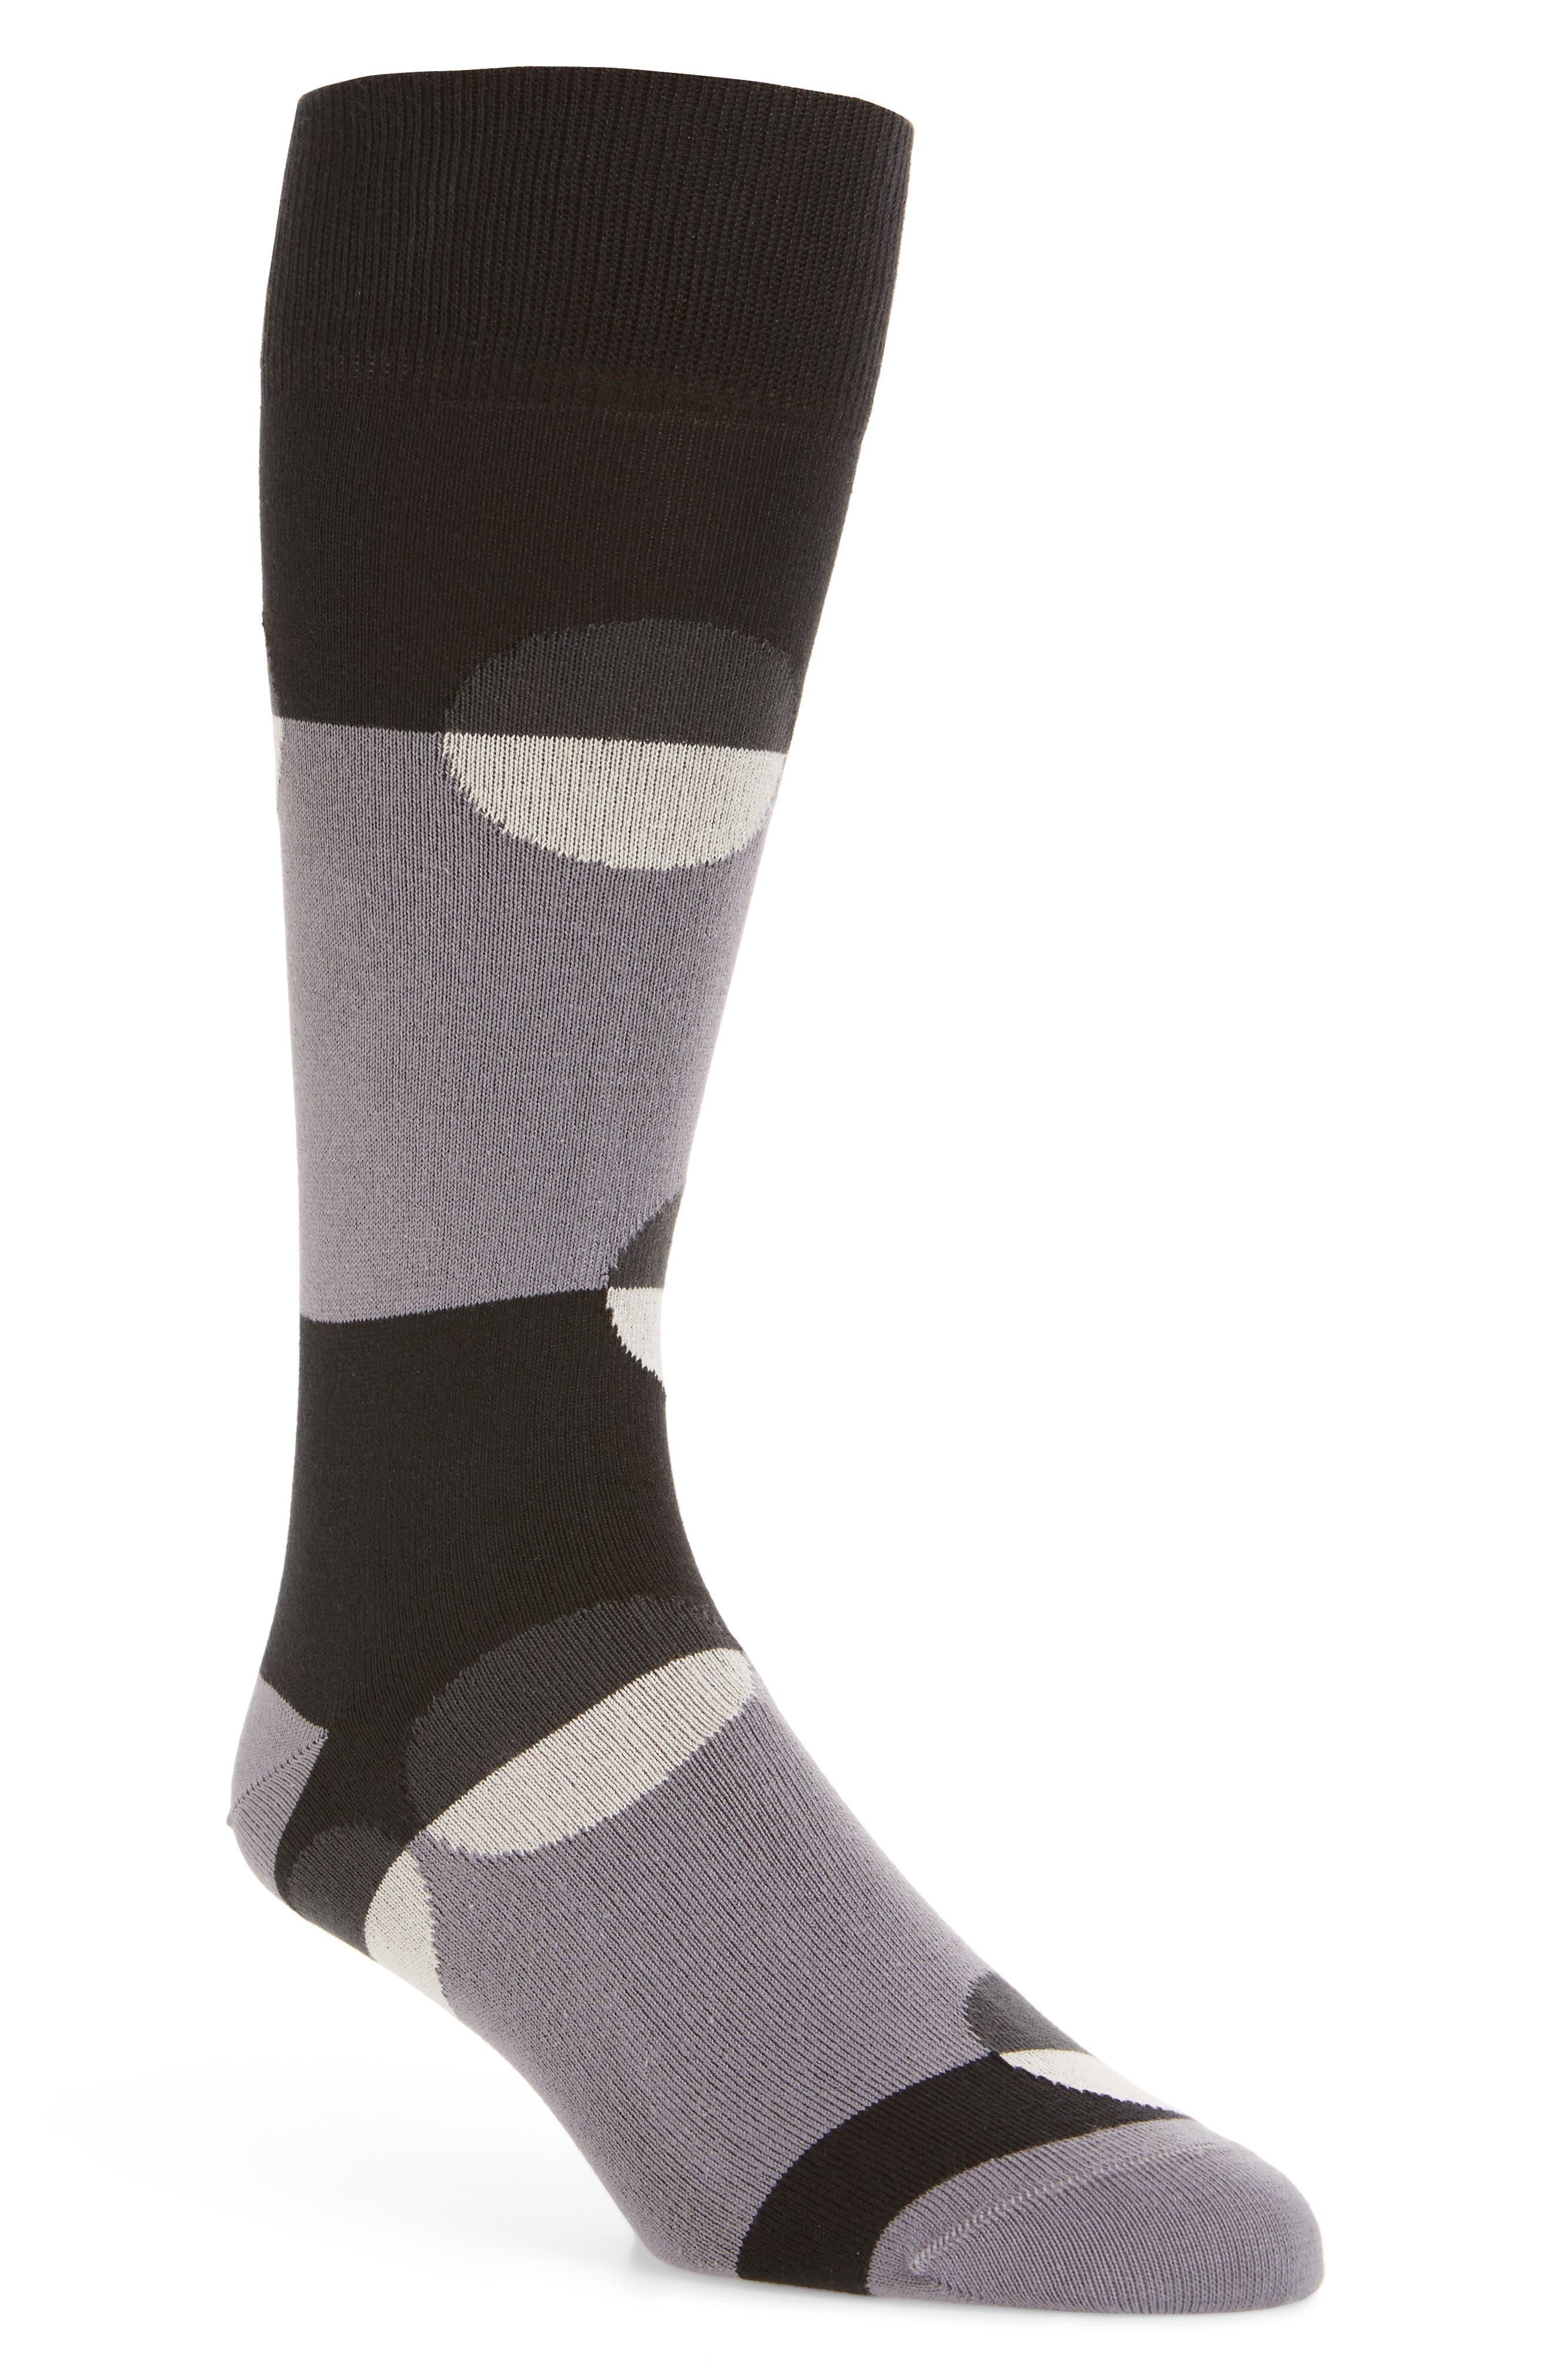 Crescent Dot Socks,                         Main,                         color, Black